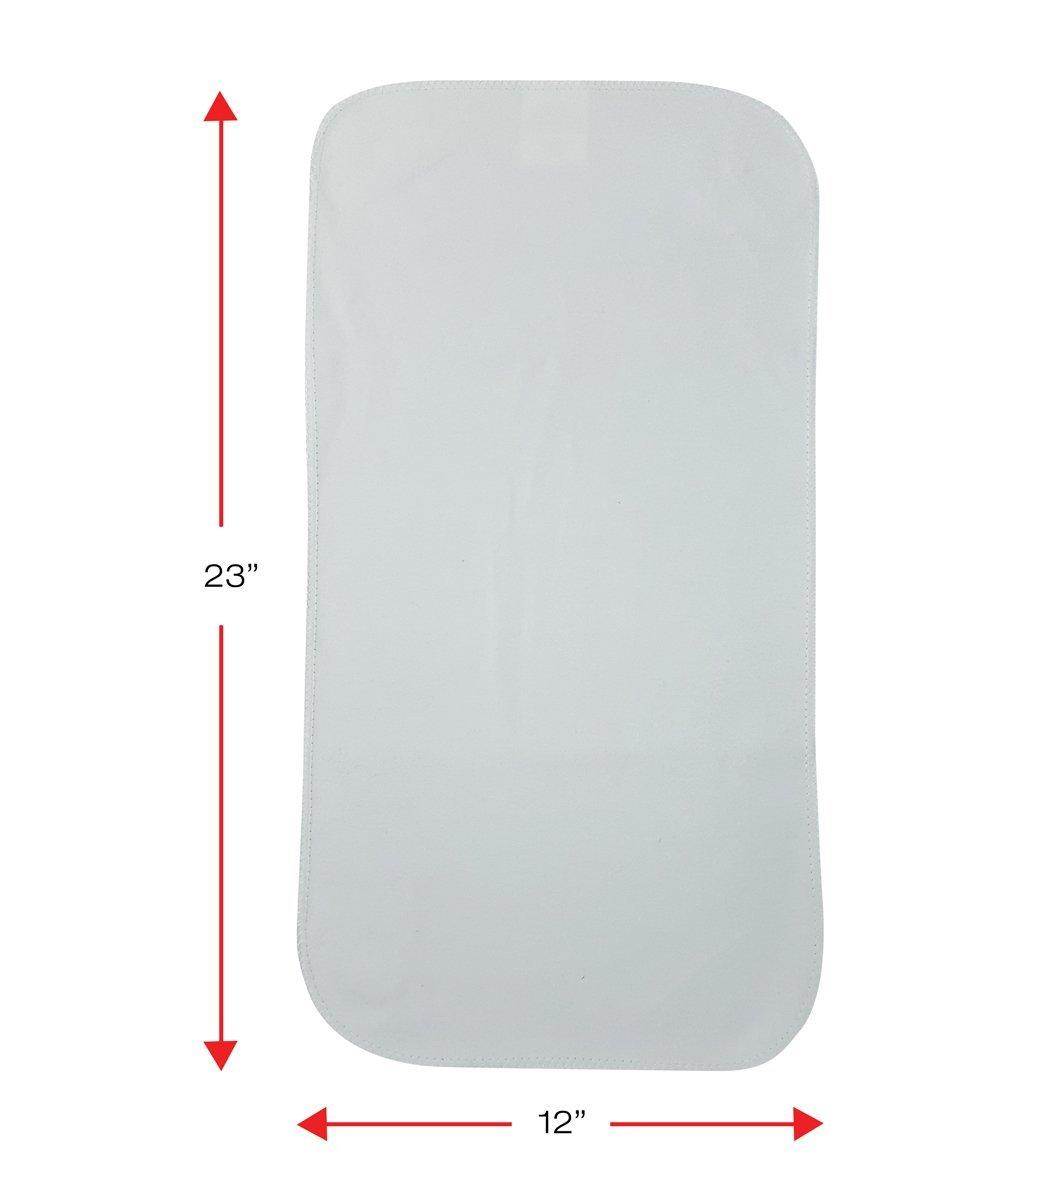 Snoozy 3 Piece Flannel Waterproof Reversible Changing Pad Liners Fiberlinks Textiles Inc CAT-S2211FW/3